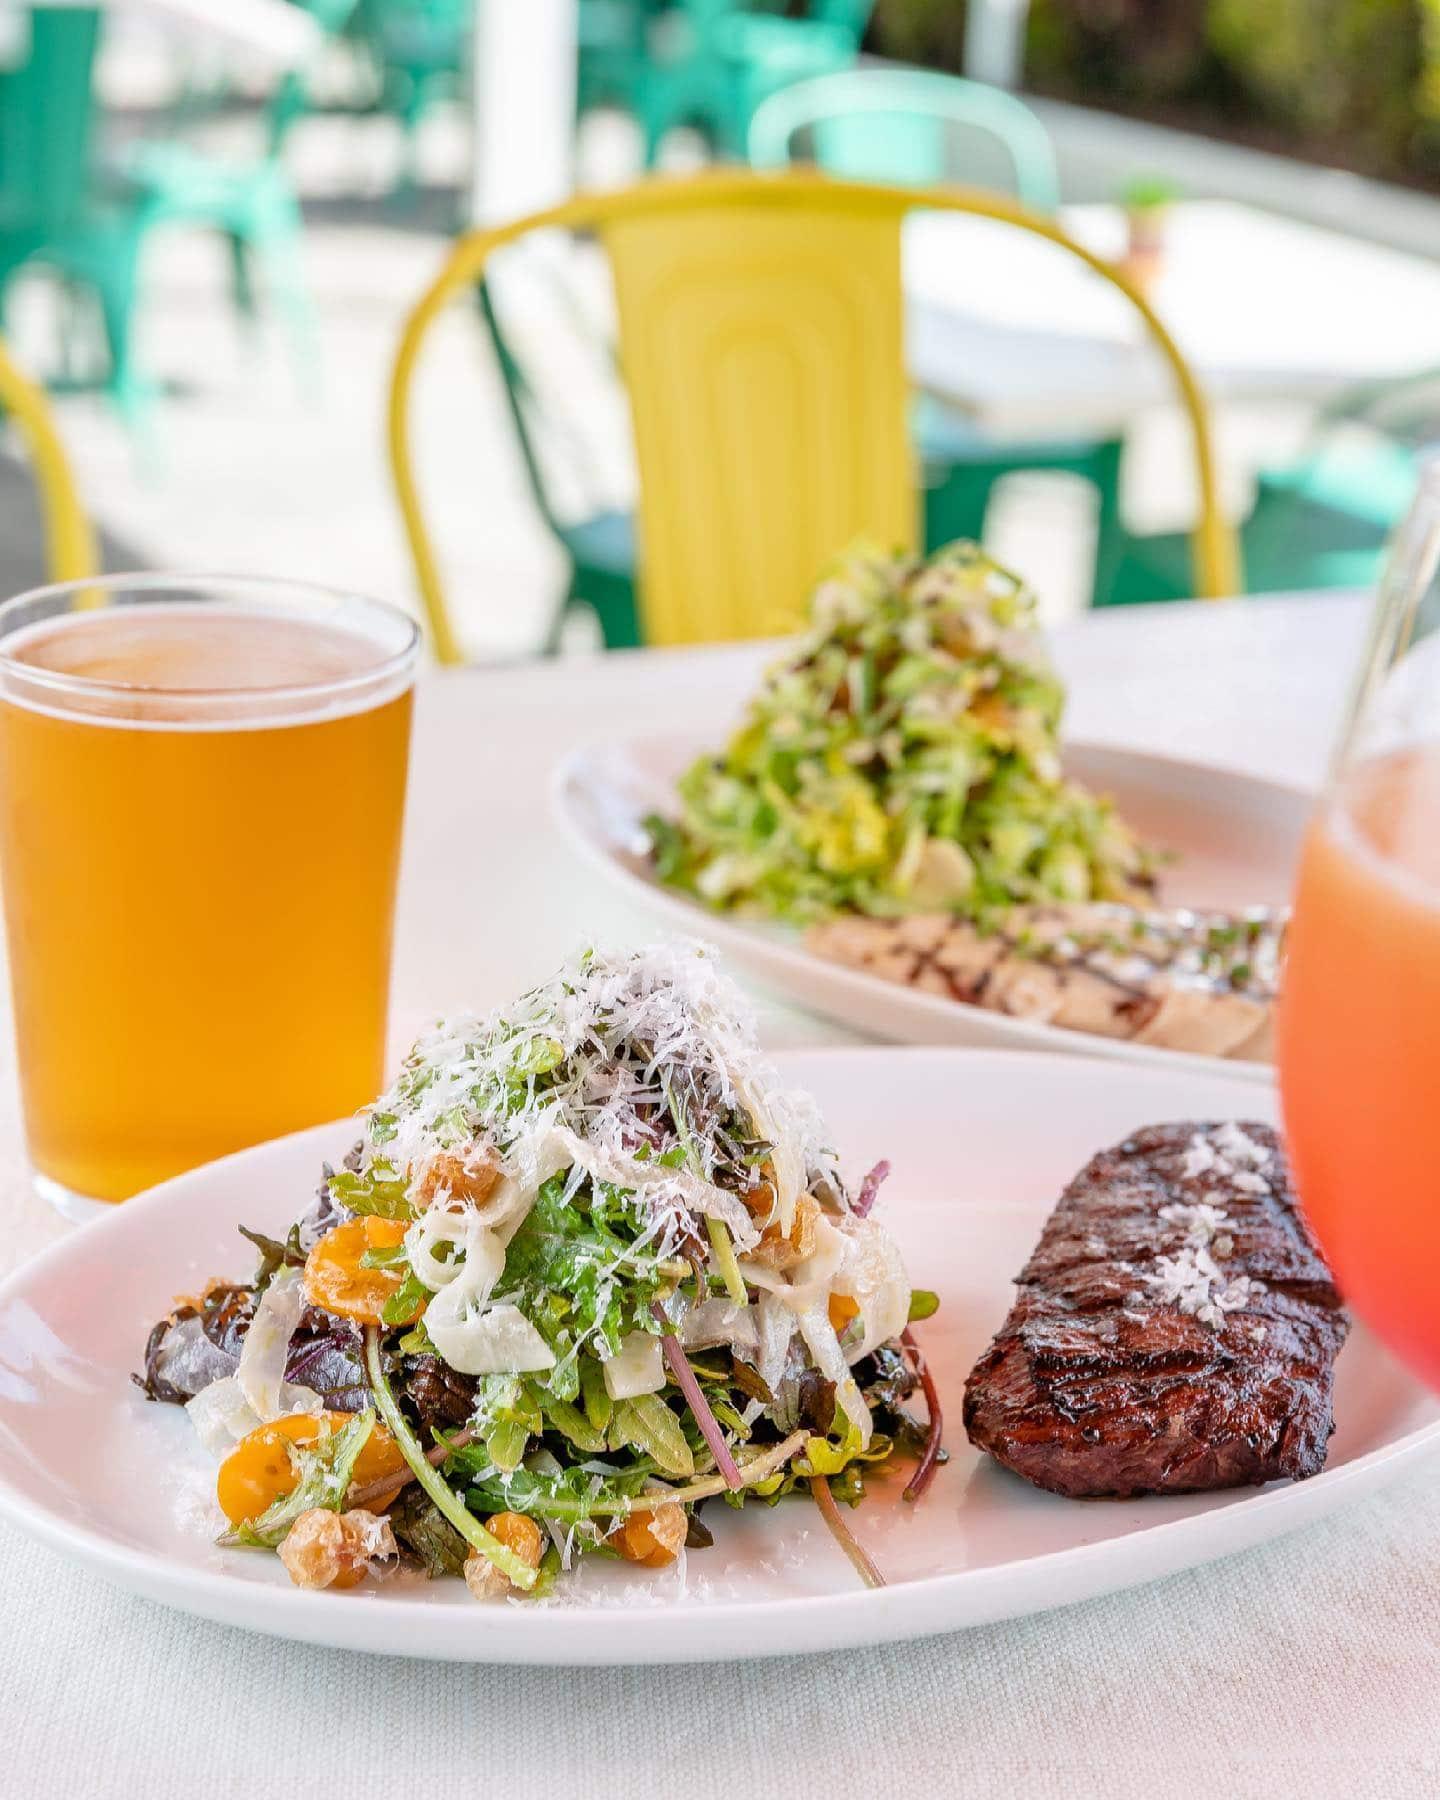 Baywood MiMo Miami Historic District Hidden Gem REstaurant for Brunch